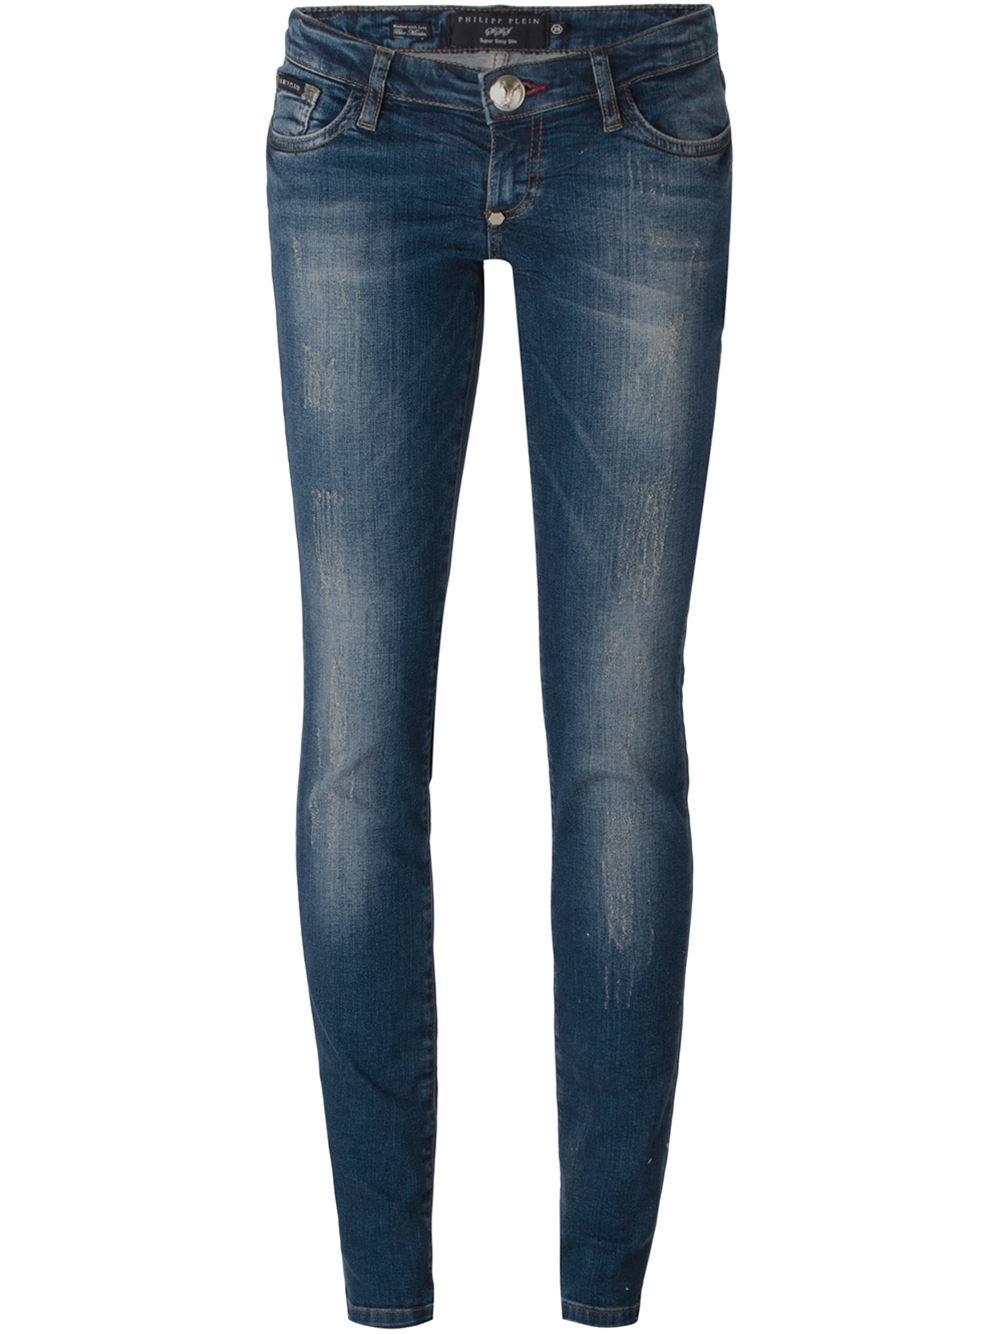 philipp plein 39 meow 39 slim fit jeans in blue lyst. Black Bedroom Furniture Sets. Home Design Ideas